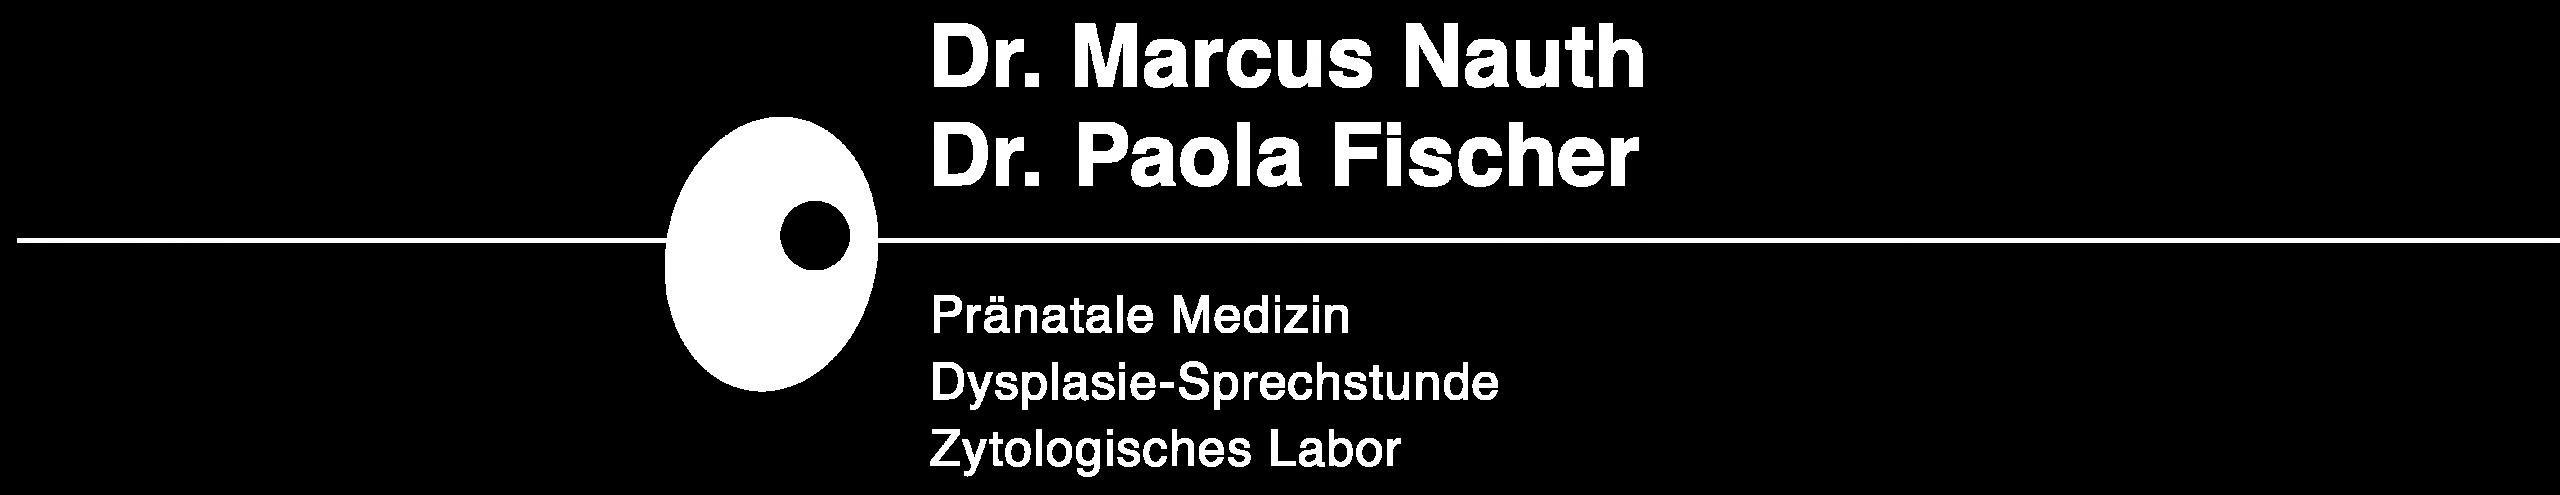 Dr. Marcus Nauth